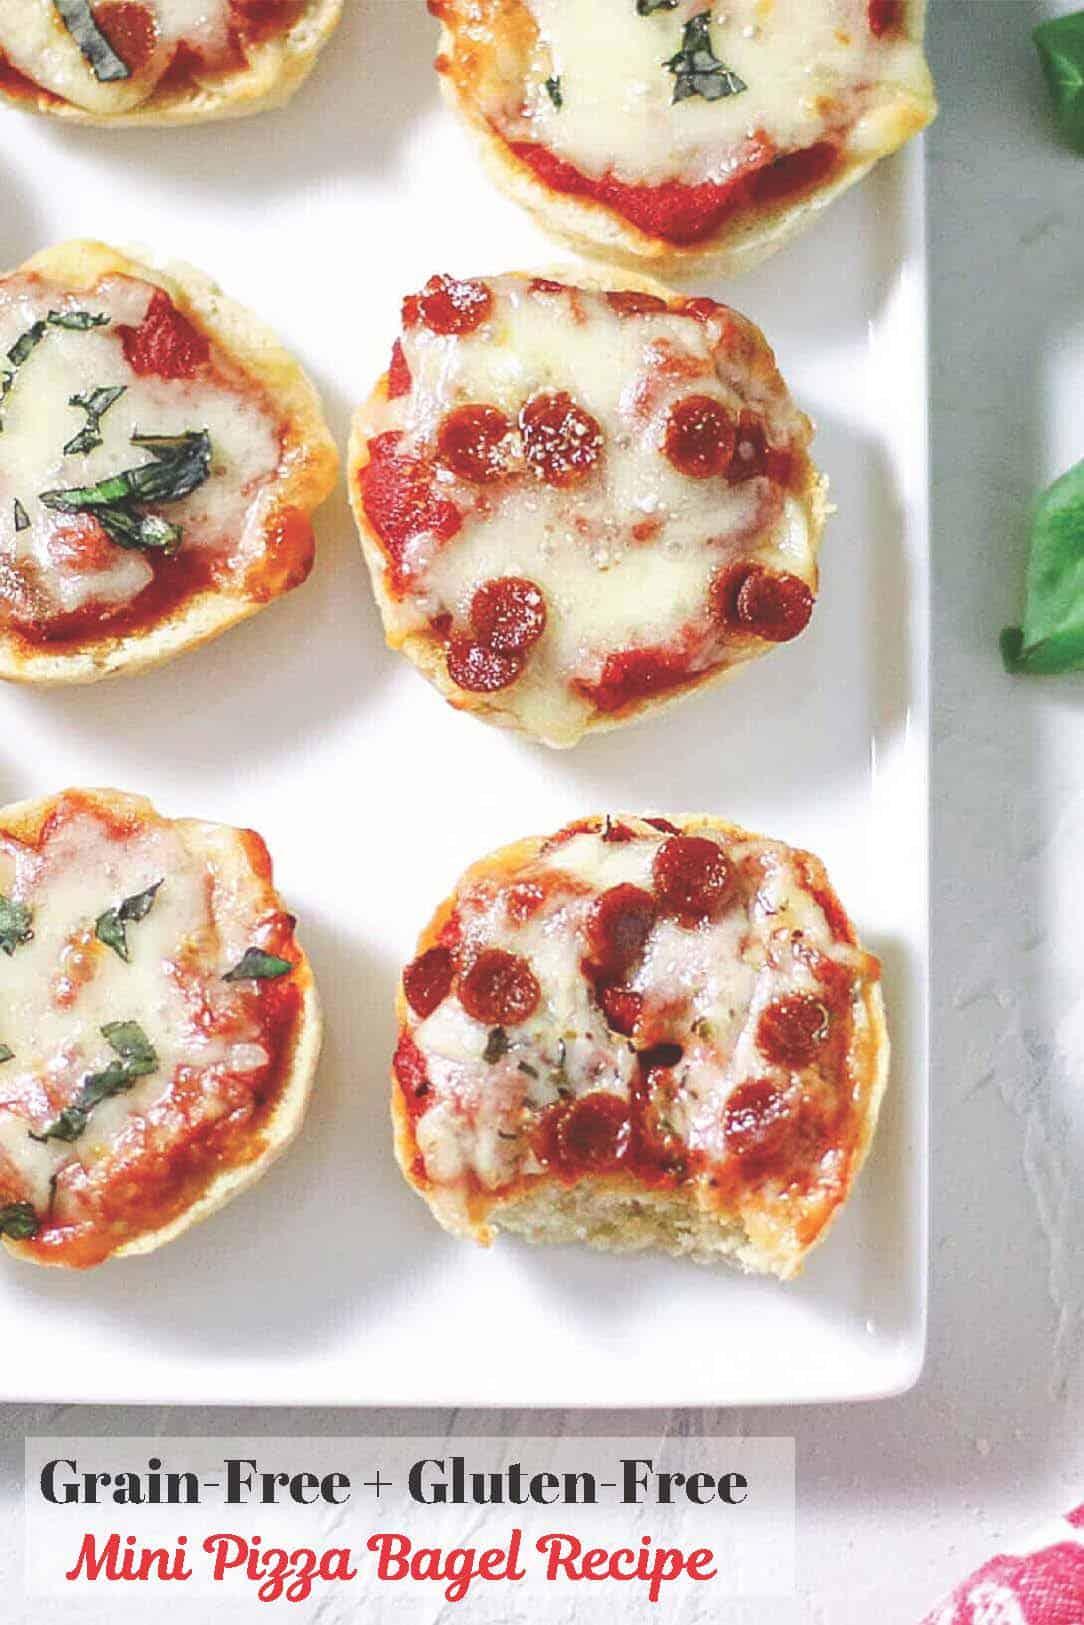 Grainless mini pizza bagels